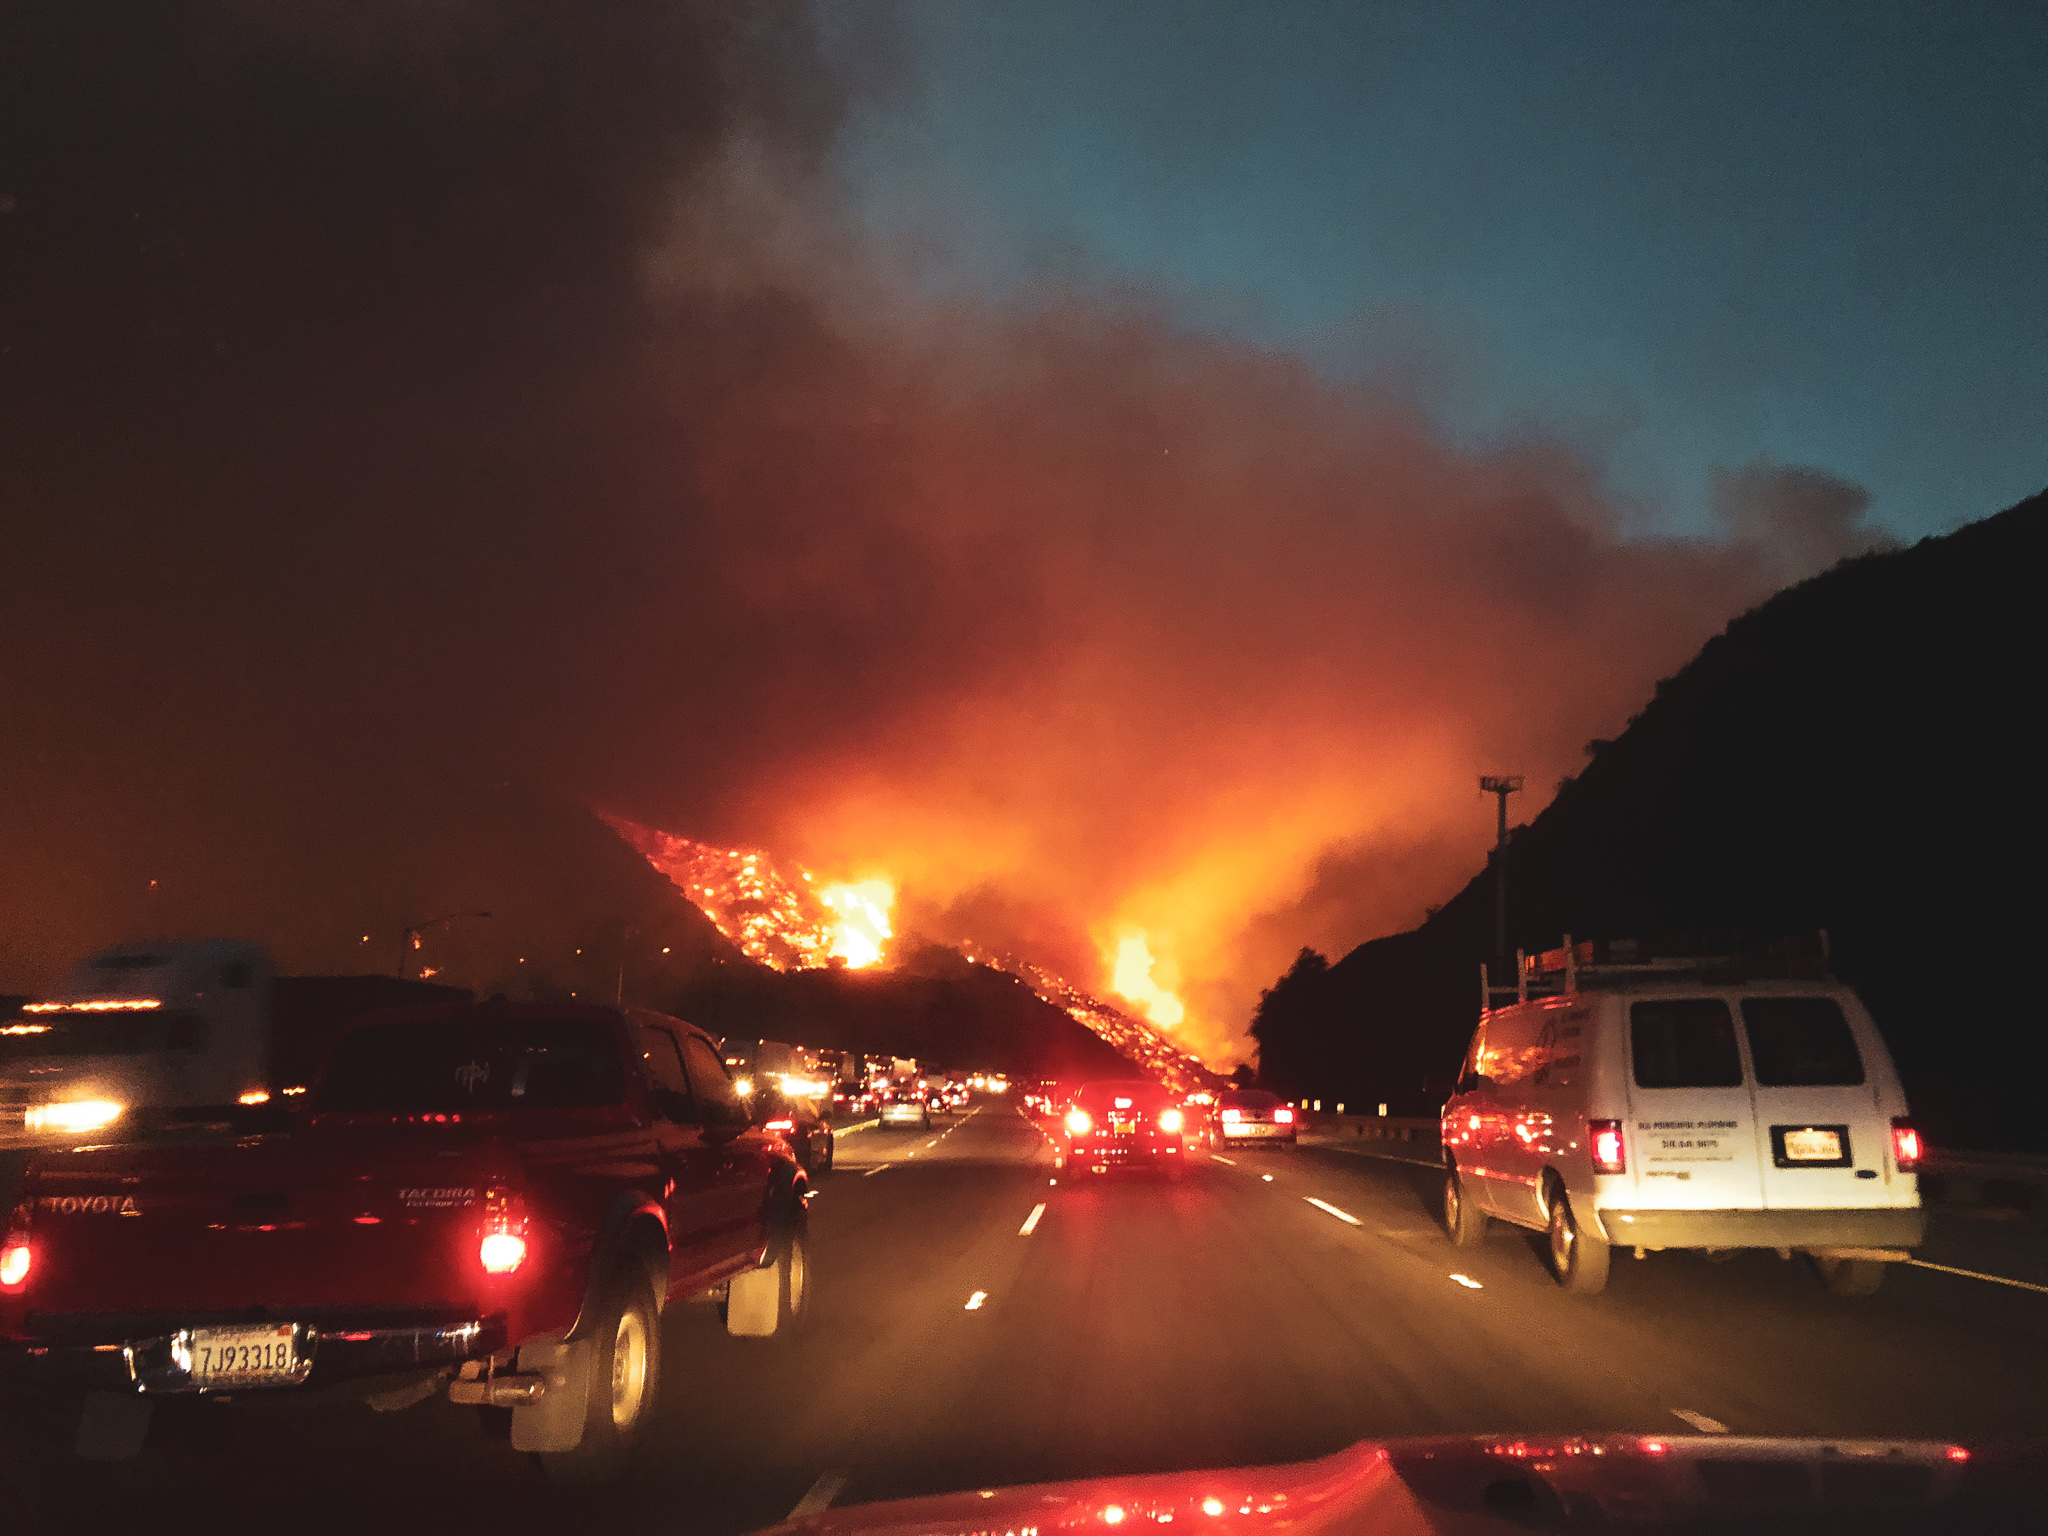 Sepulveda Fire 2017